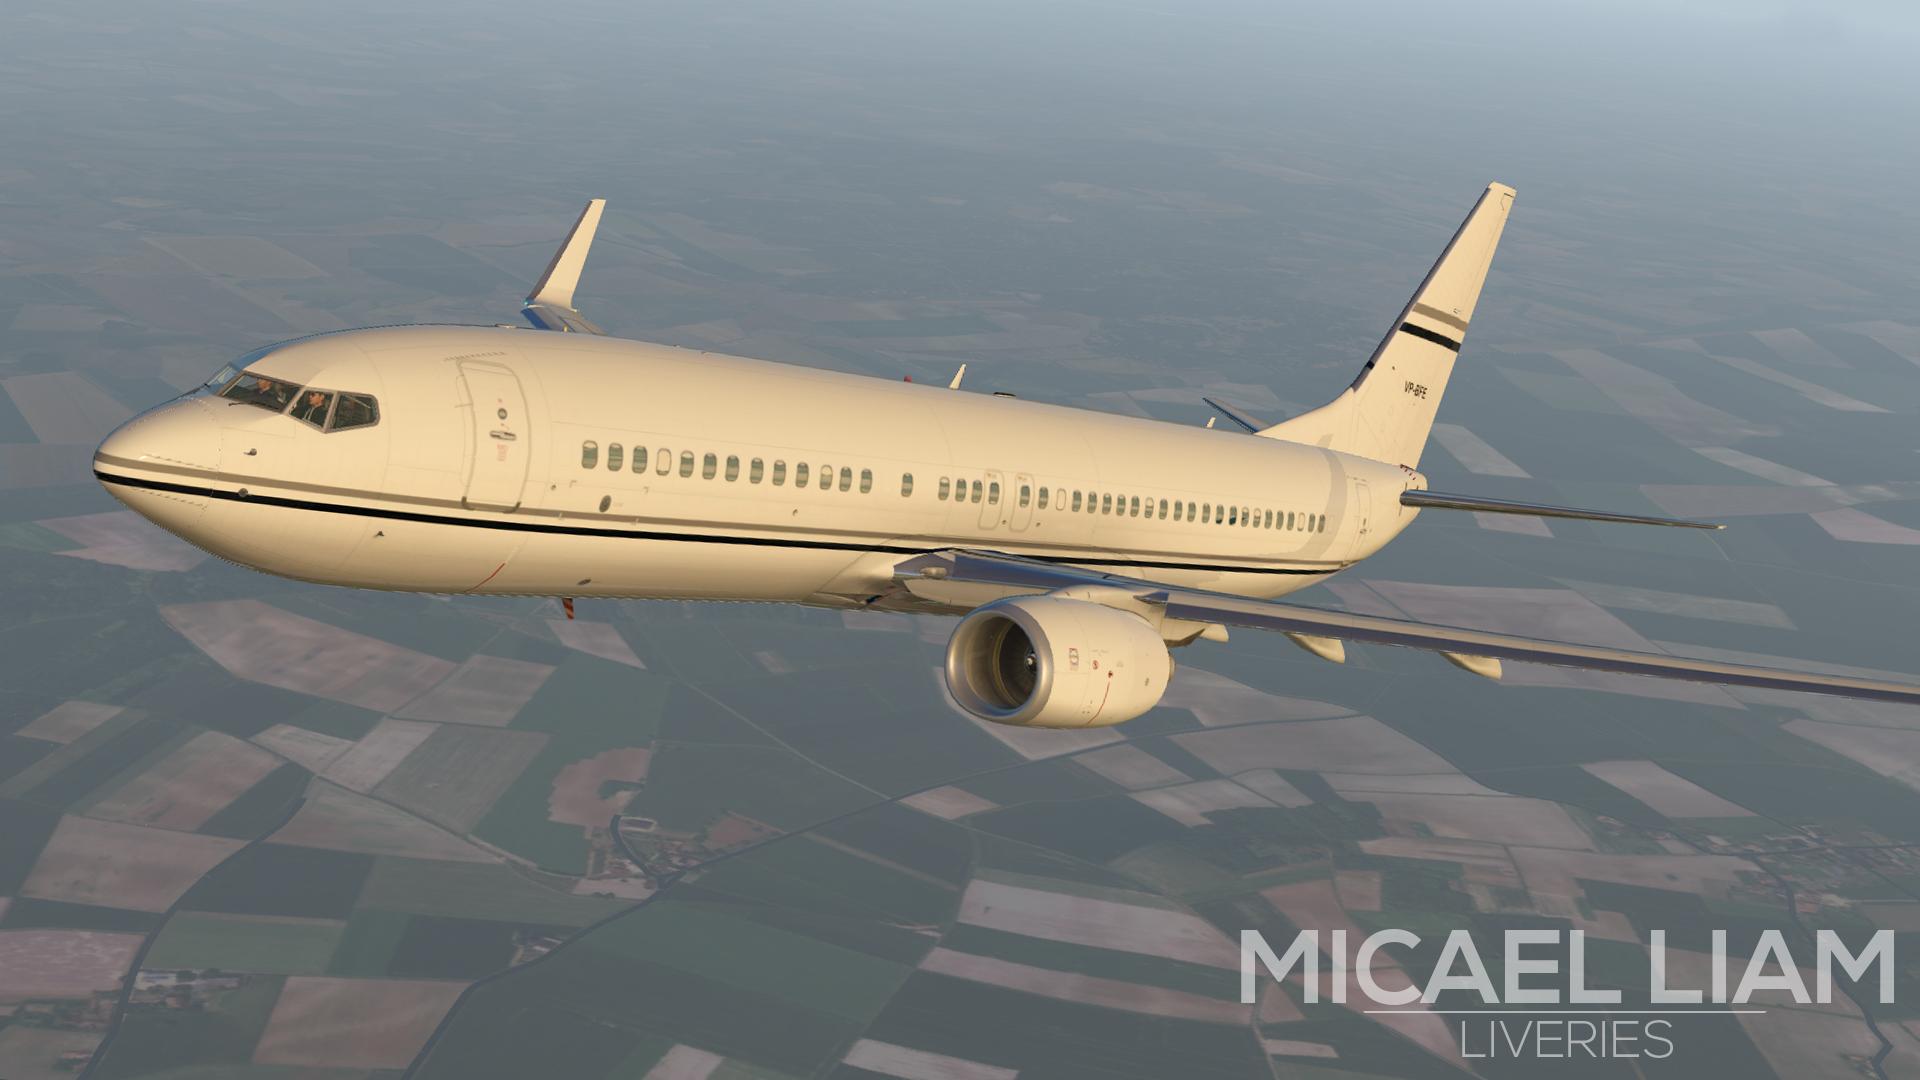 Private 737 livery [VP-BFE] - Aircraft Skins - Liveries - X-Plane